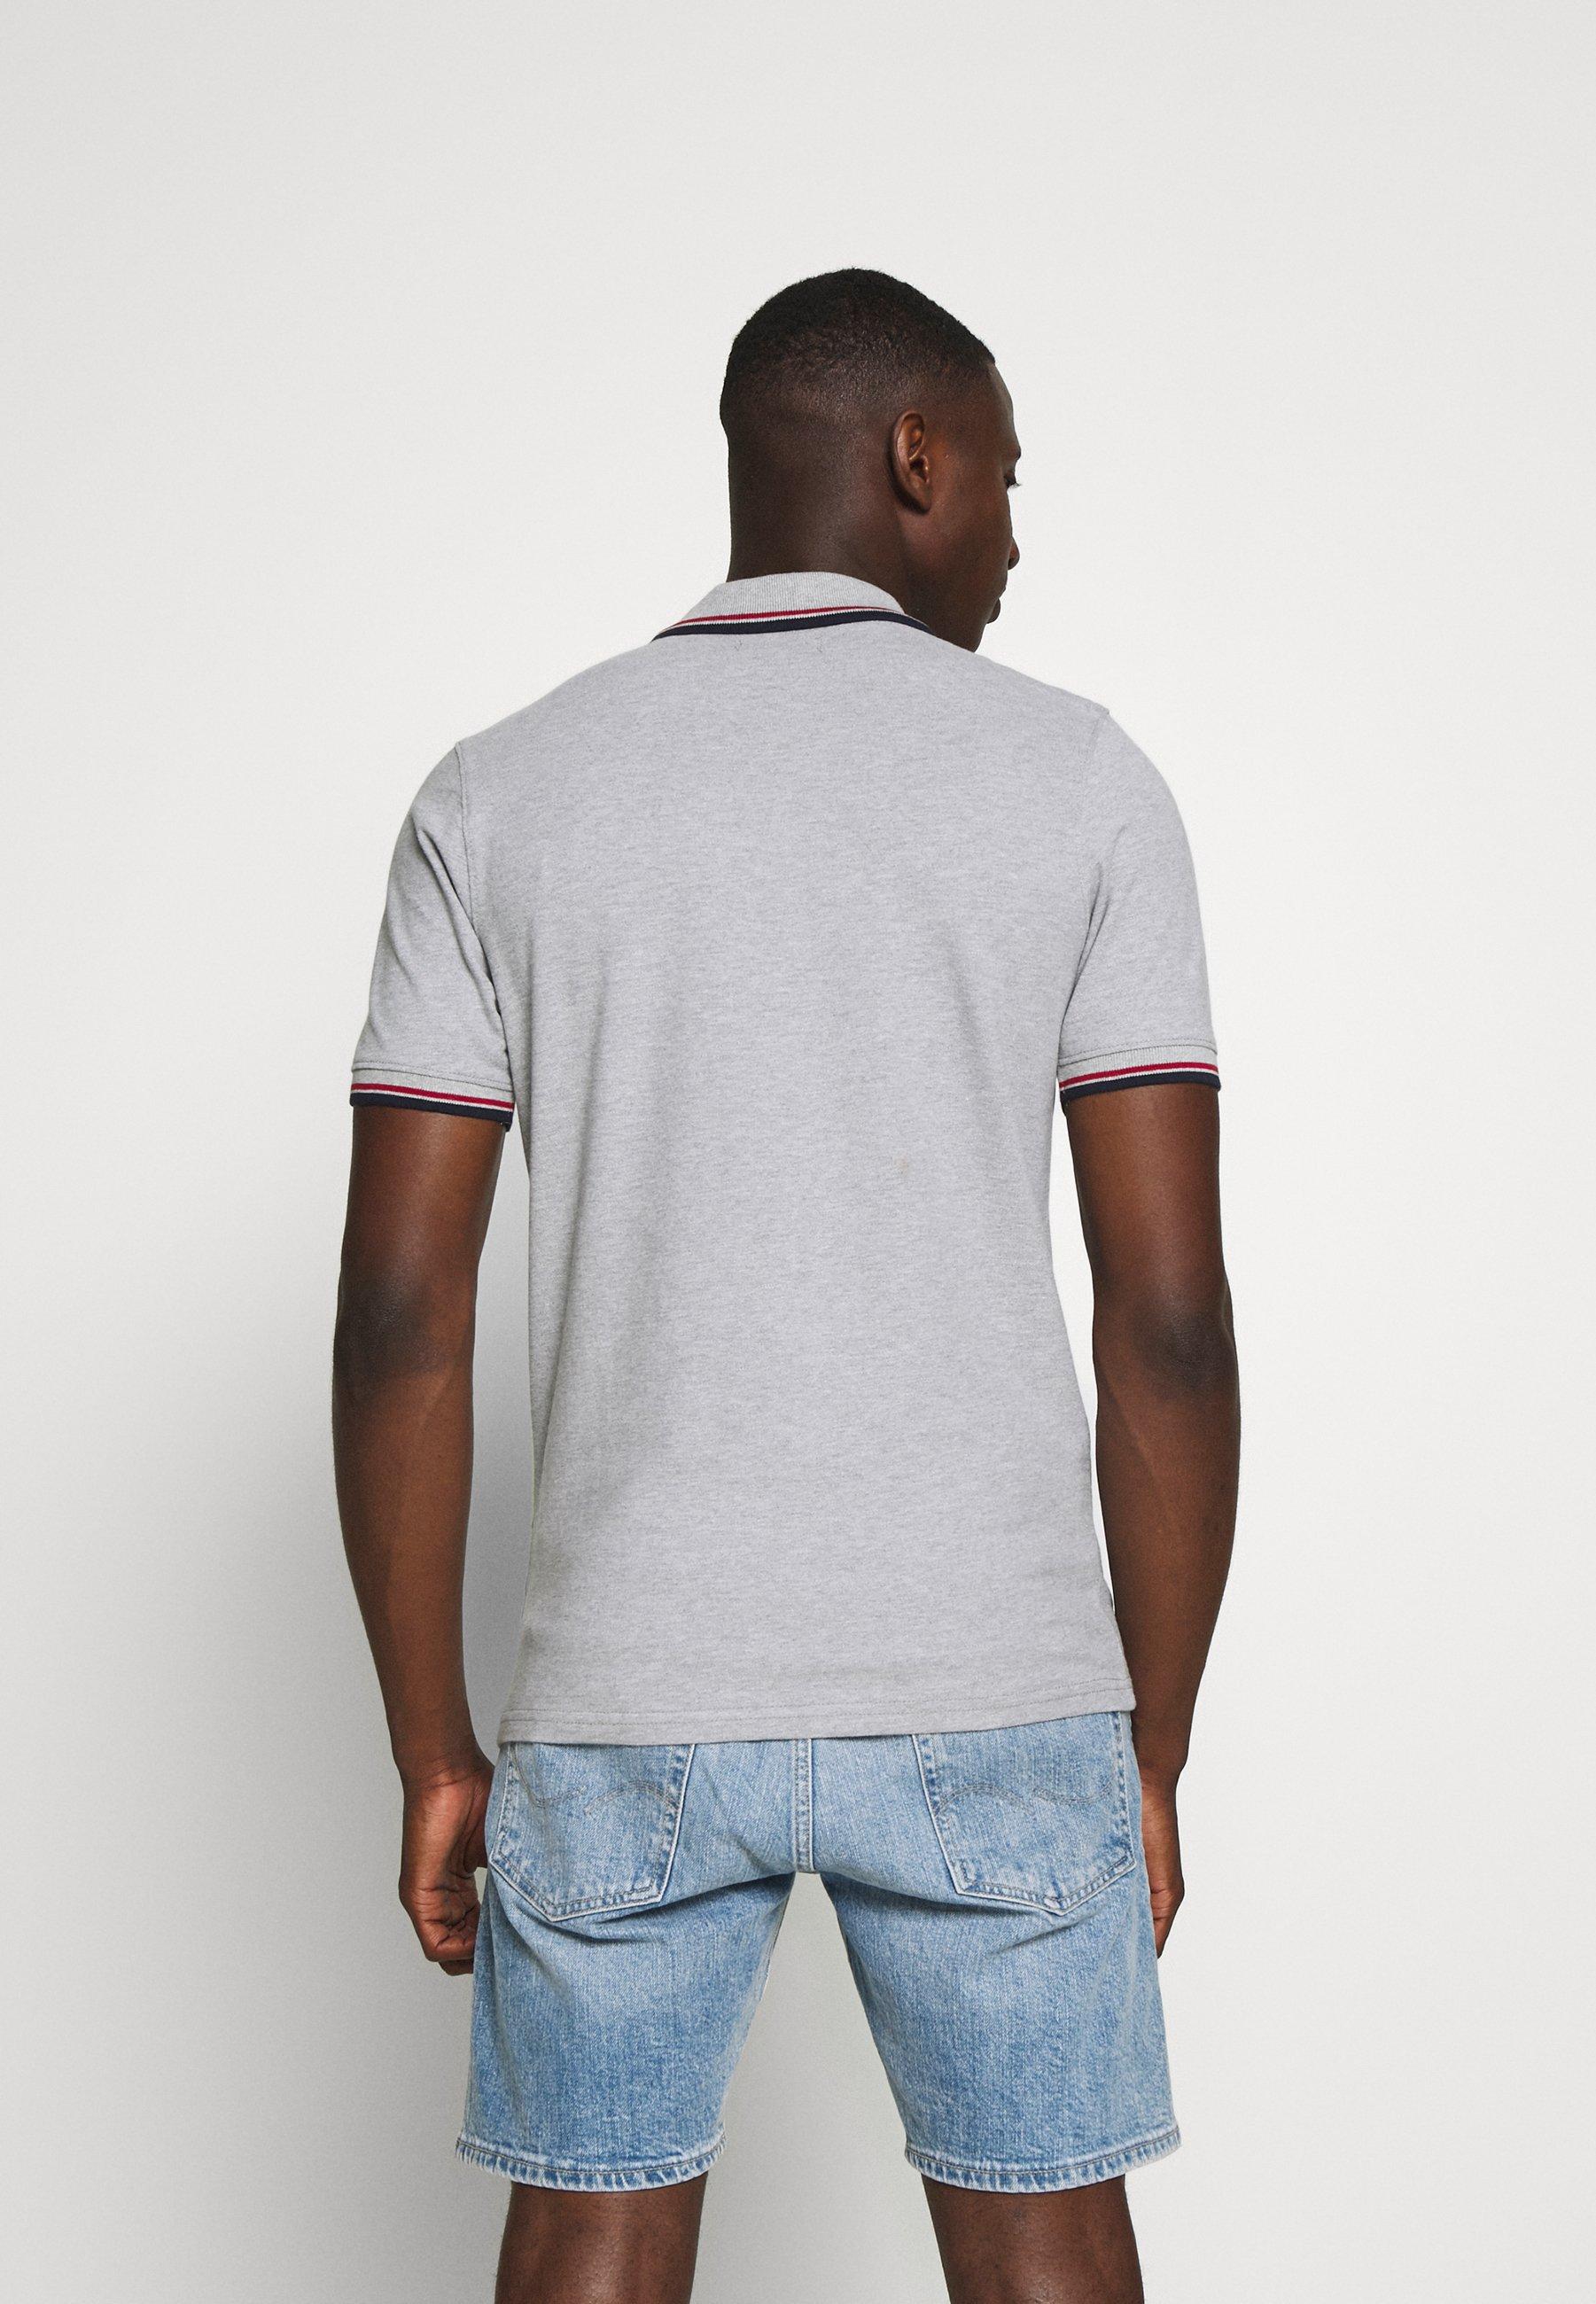 Jack & Jones JJENOAH - Polo shirt - light grey melange 0a9Fr